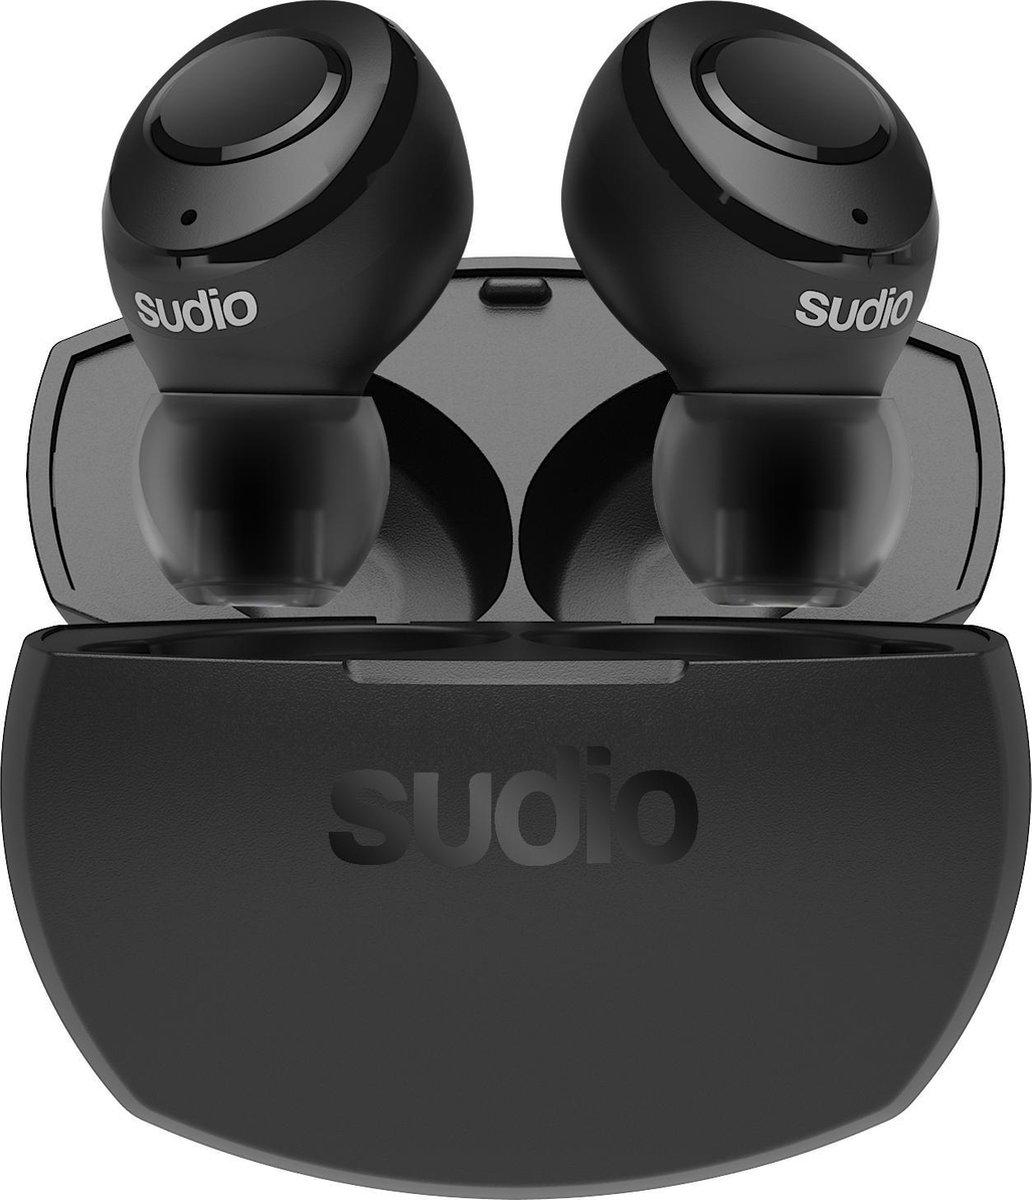 Sudio Tolv R True Wireless Earbuds @ Bol.com